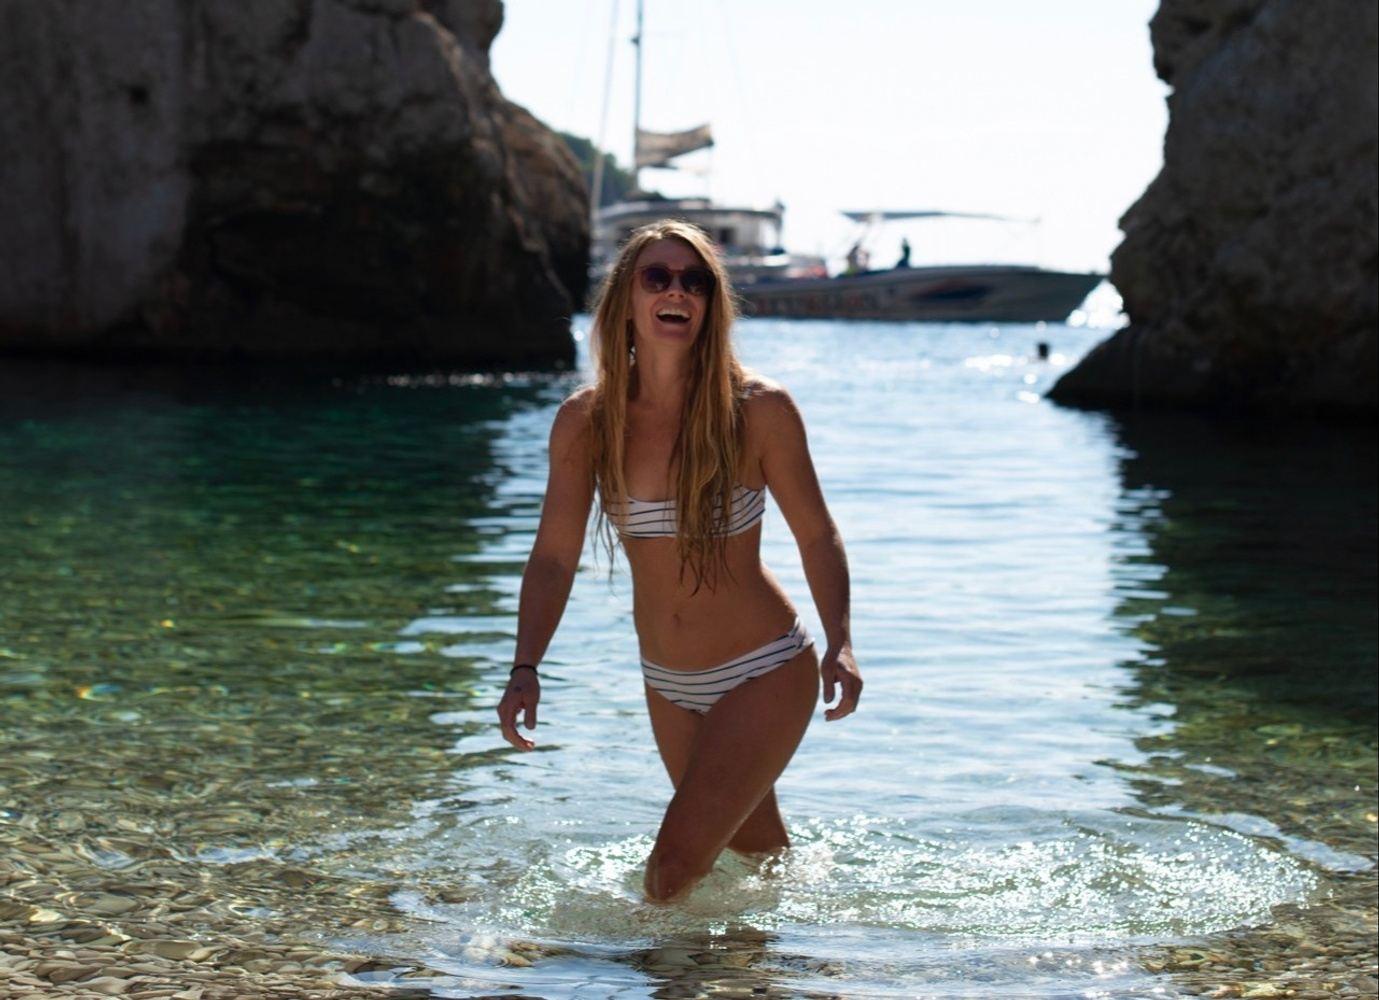 Yoga in Croatia - Hosted by Jess LeBlanc + Ritual Retreats